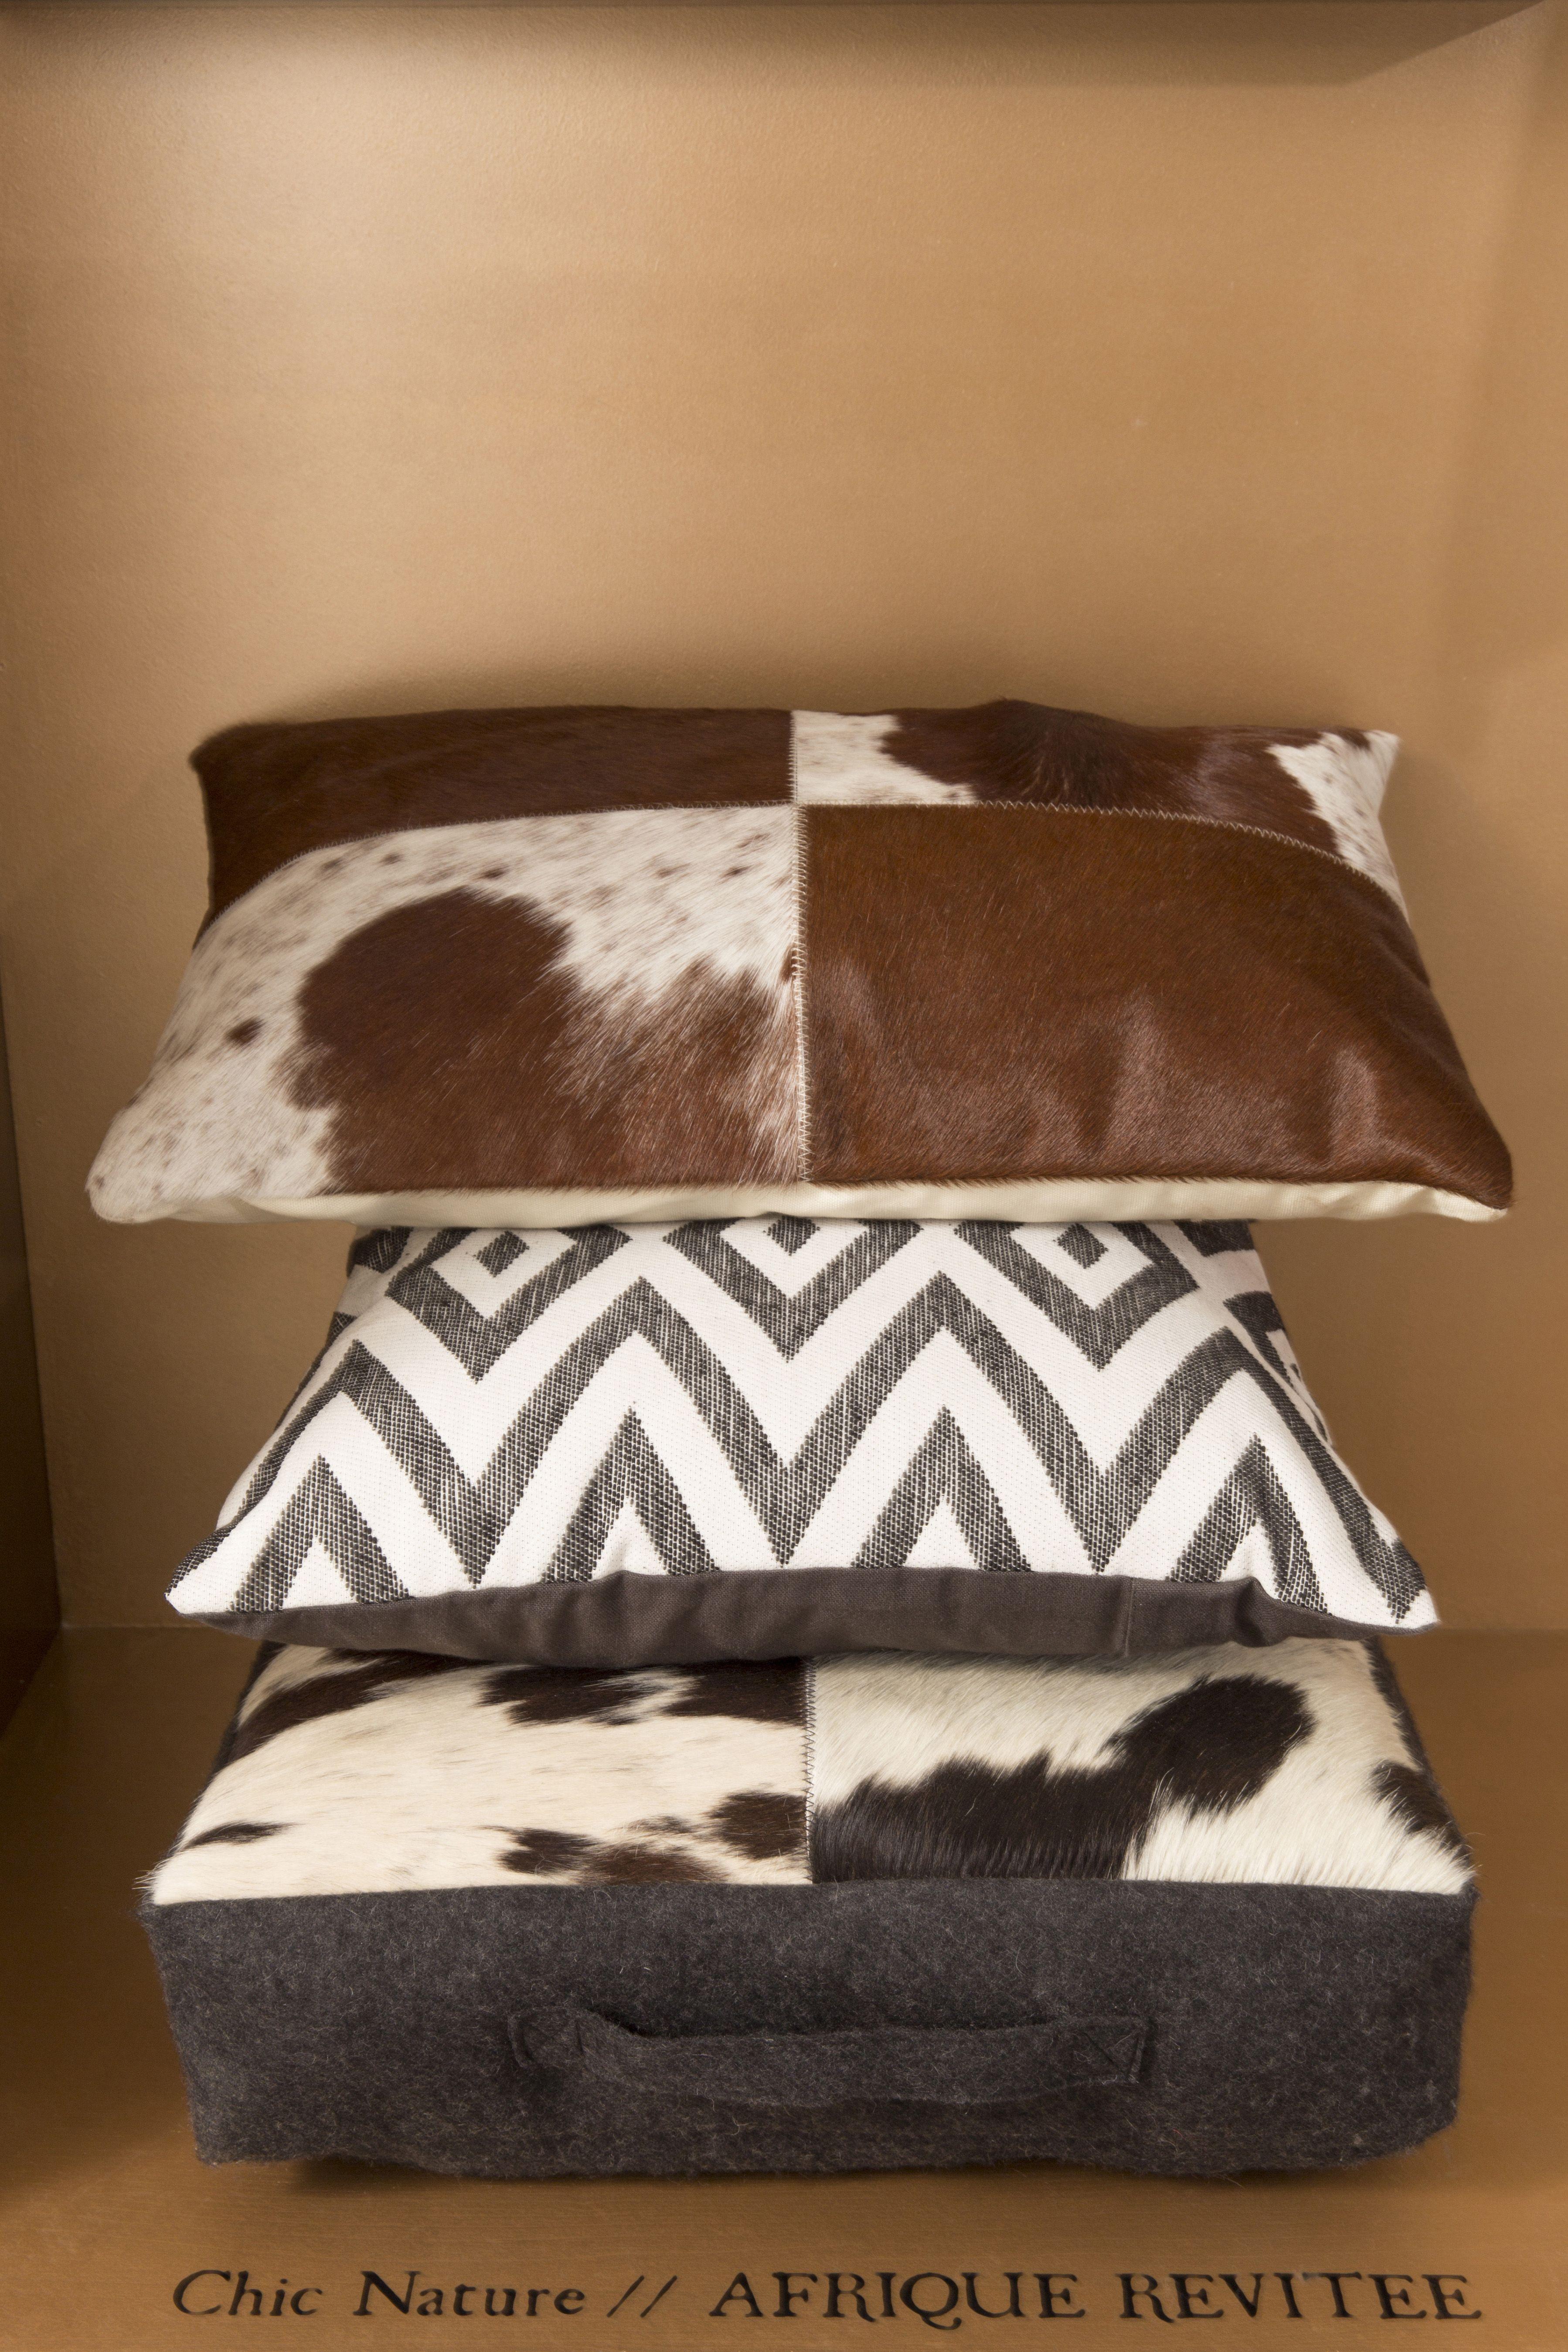 tapis vache leroy merlin tapis gris shaggy lizzy l x l cm leroy merlin with tapis vache leroy. Black Bedroom Furniture Sets. Home Design Ideas